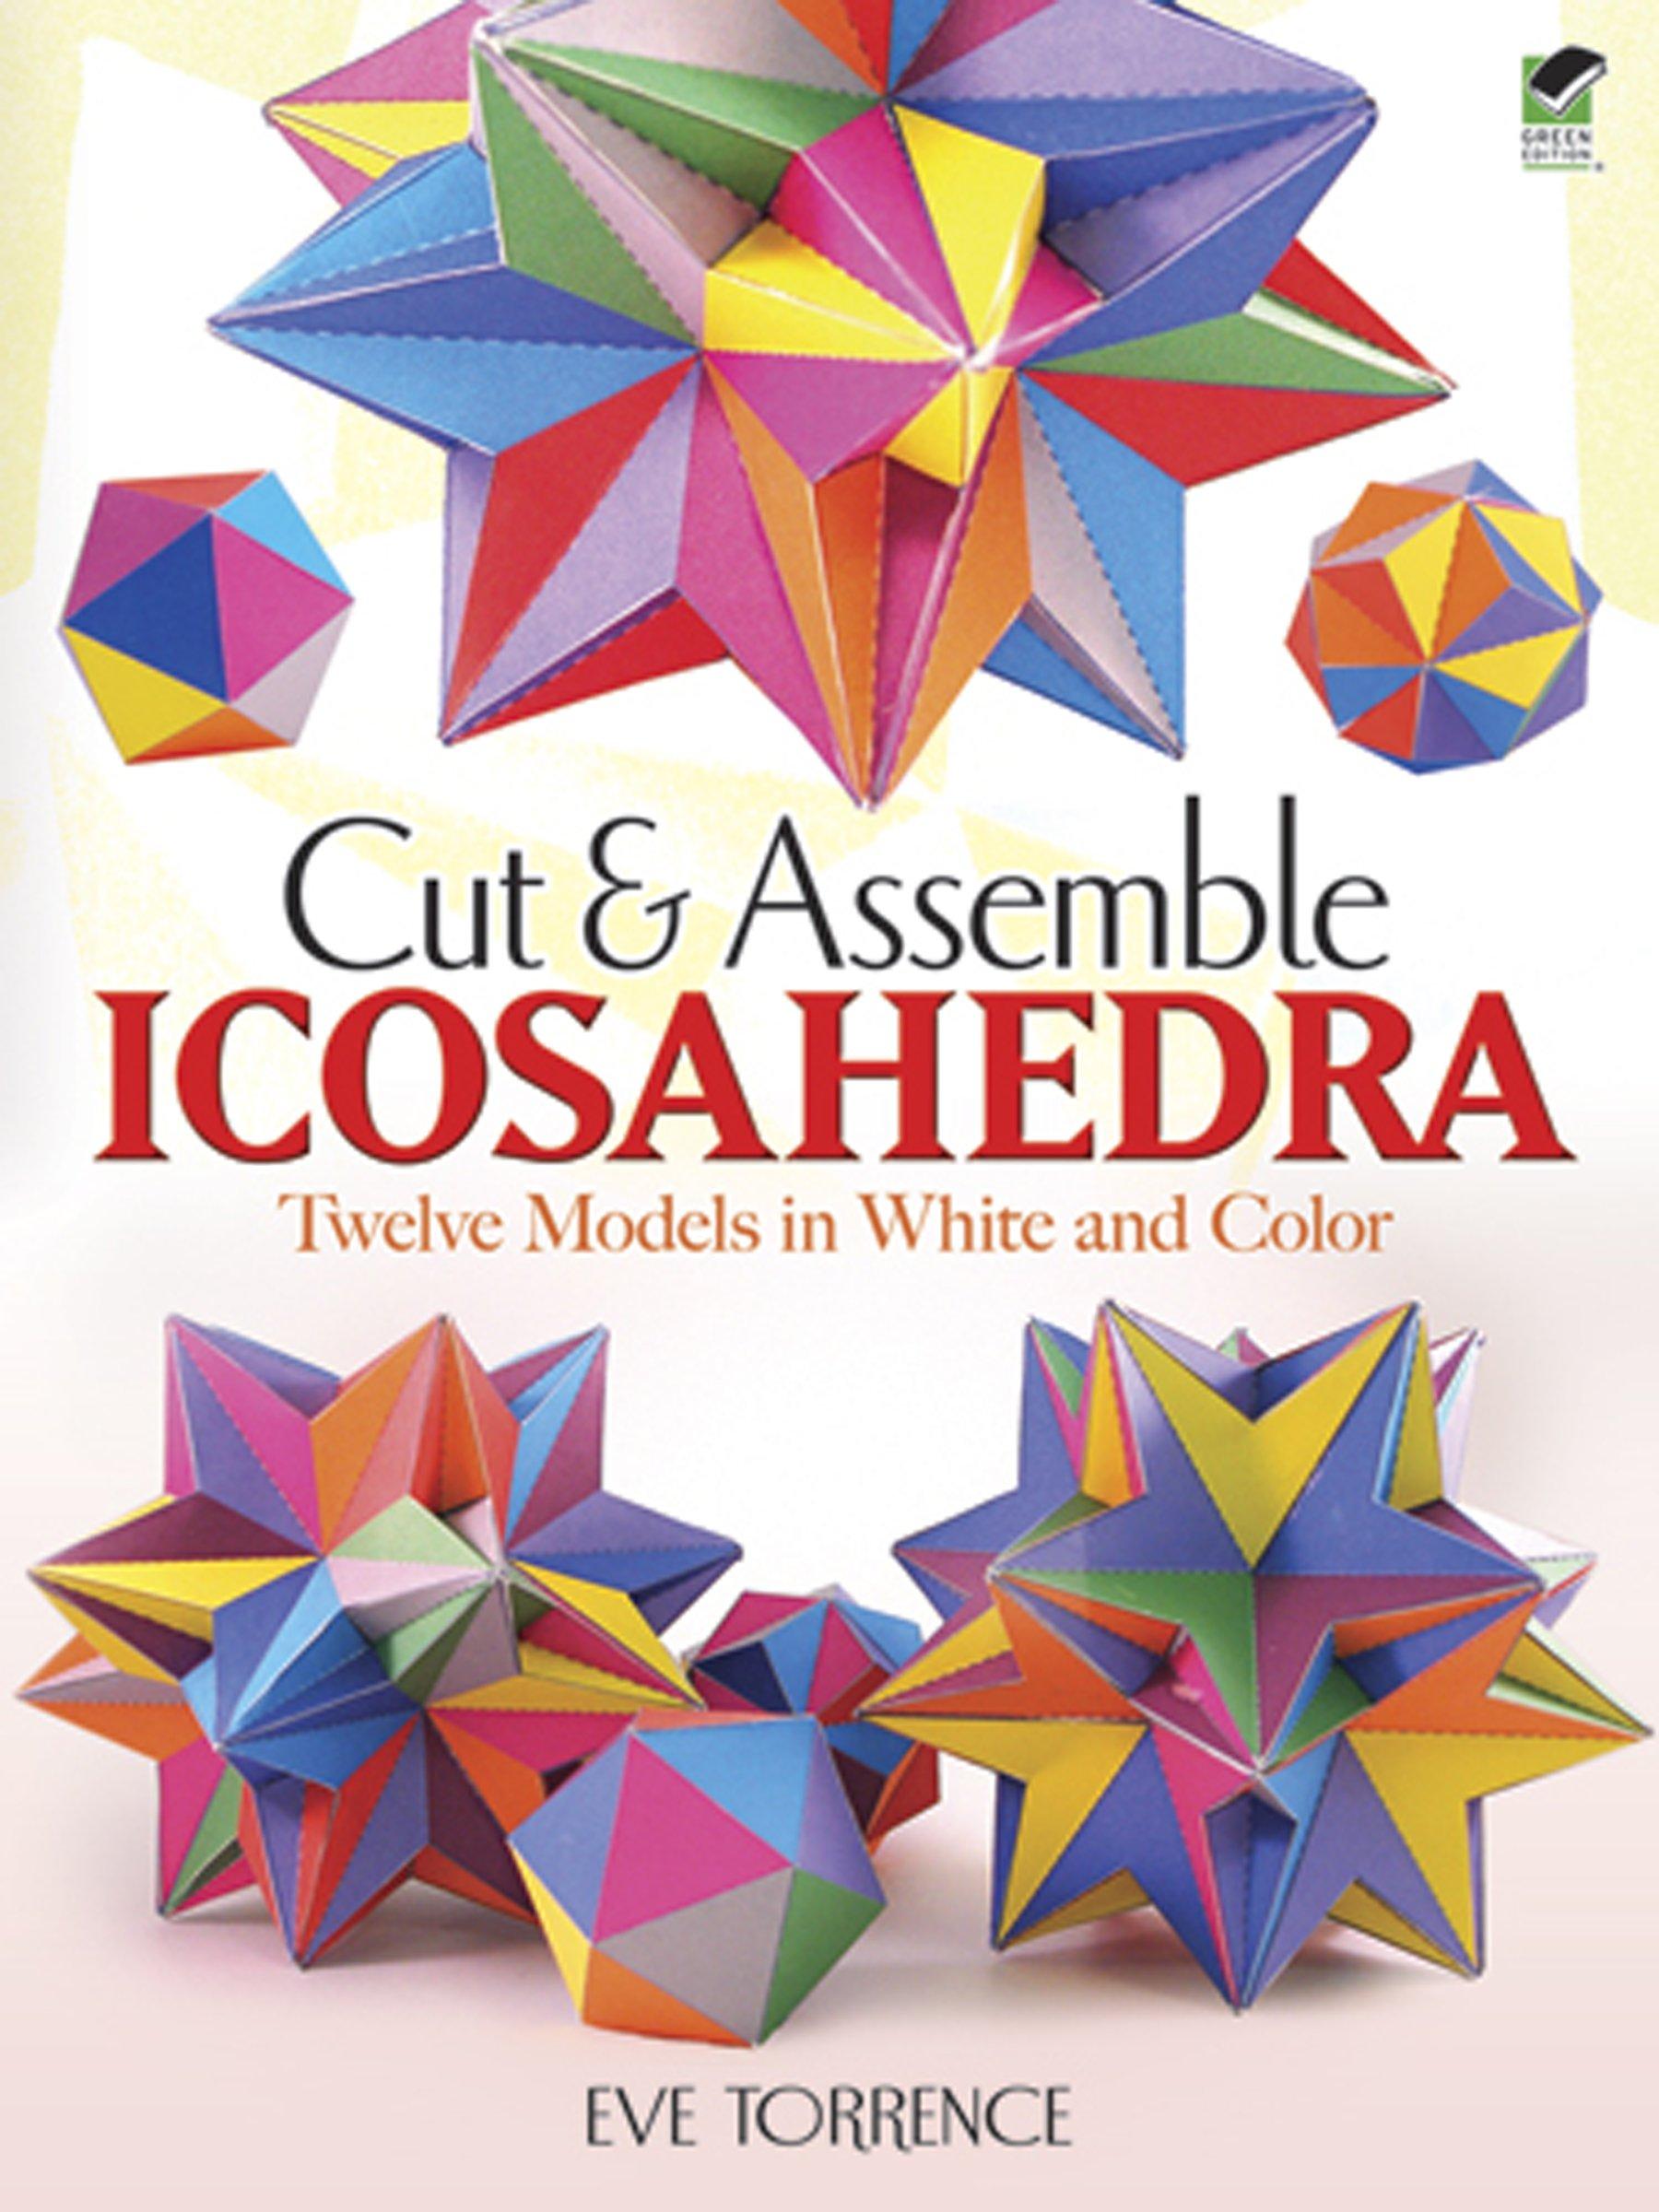 Origami Icosahedron Images, Stock Photos & Vectors | Shutterstock | 2400x1800